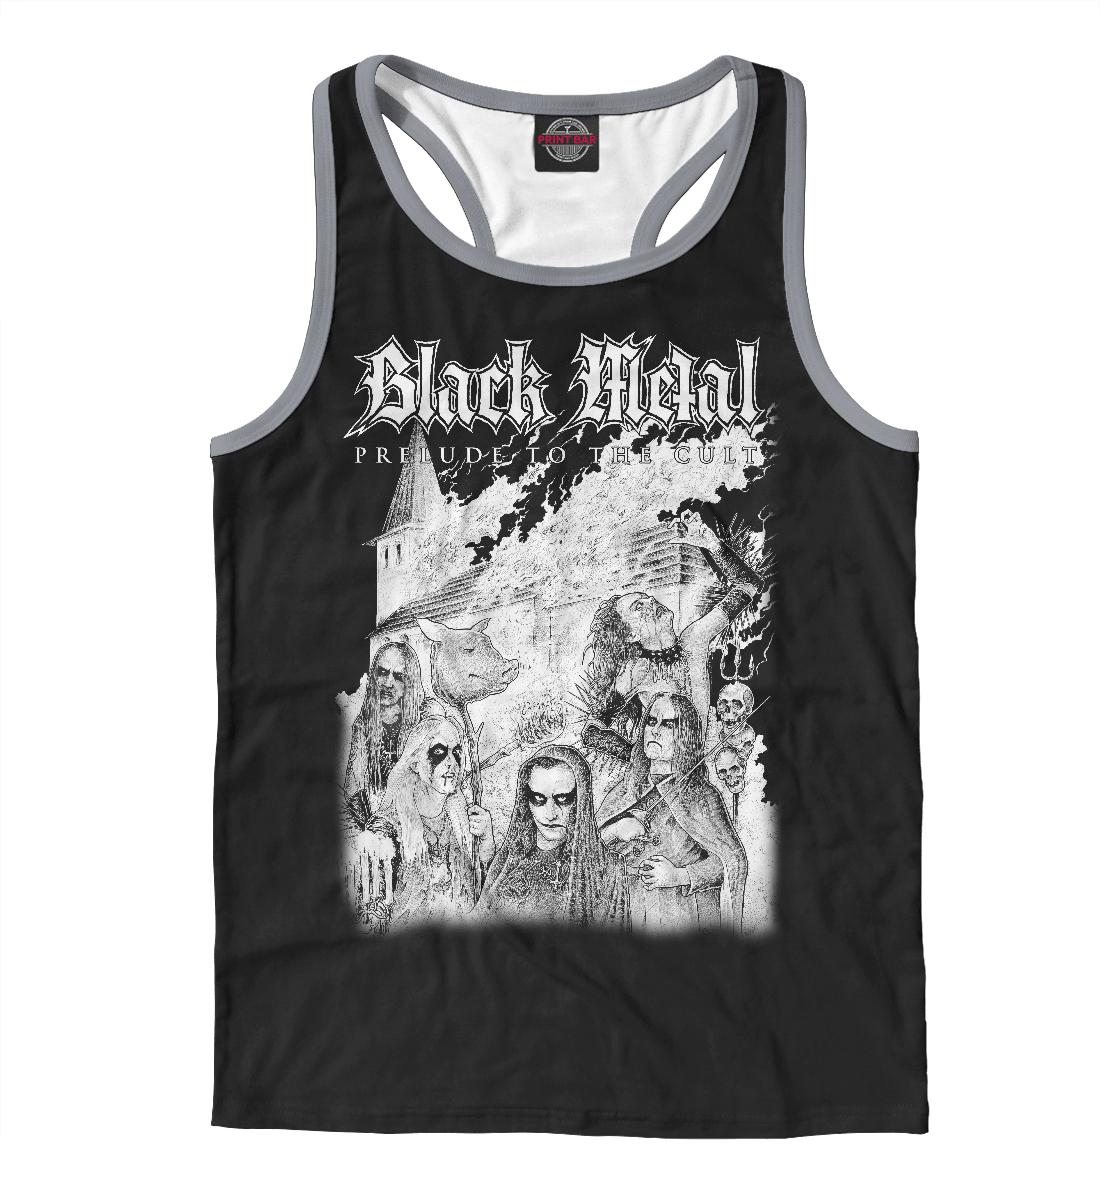 Black Metal, Printbar, Майки борцовки, MZK-267645-mayb-2  - купить со скидкой